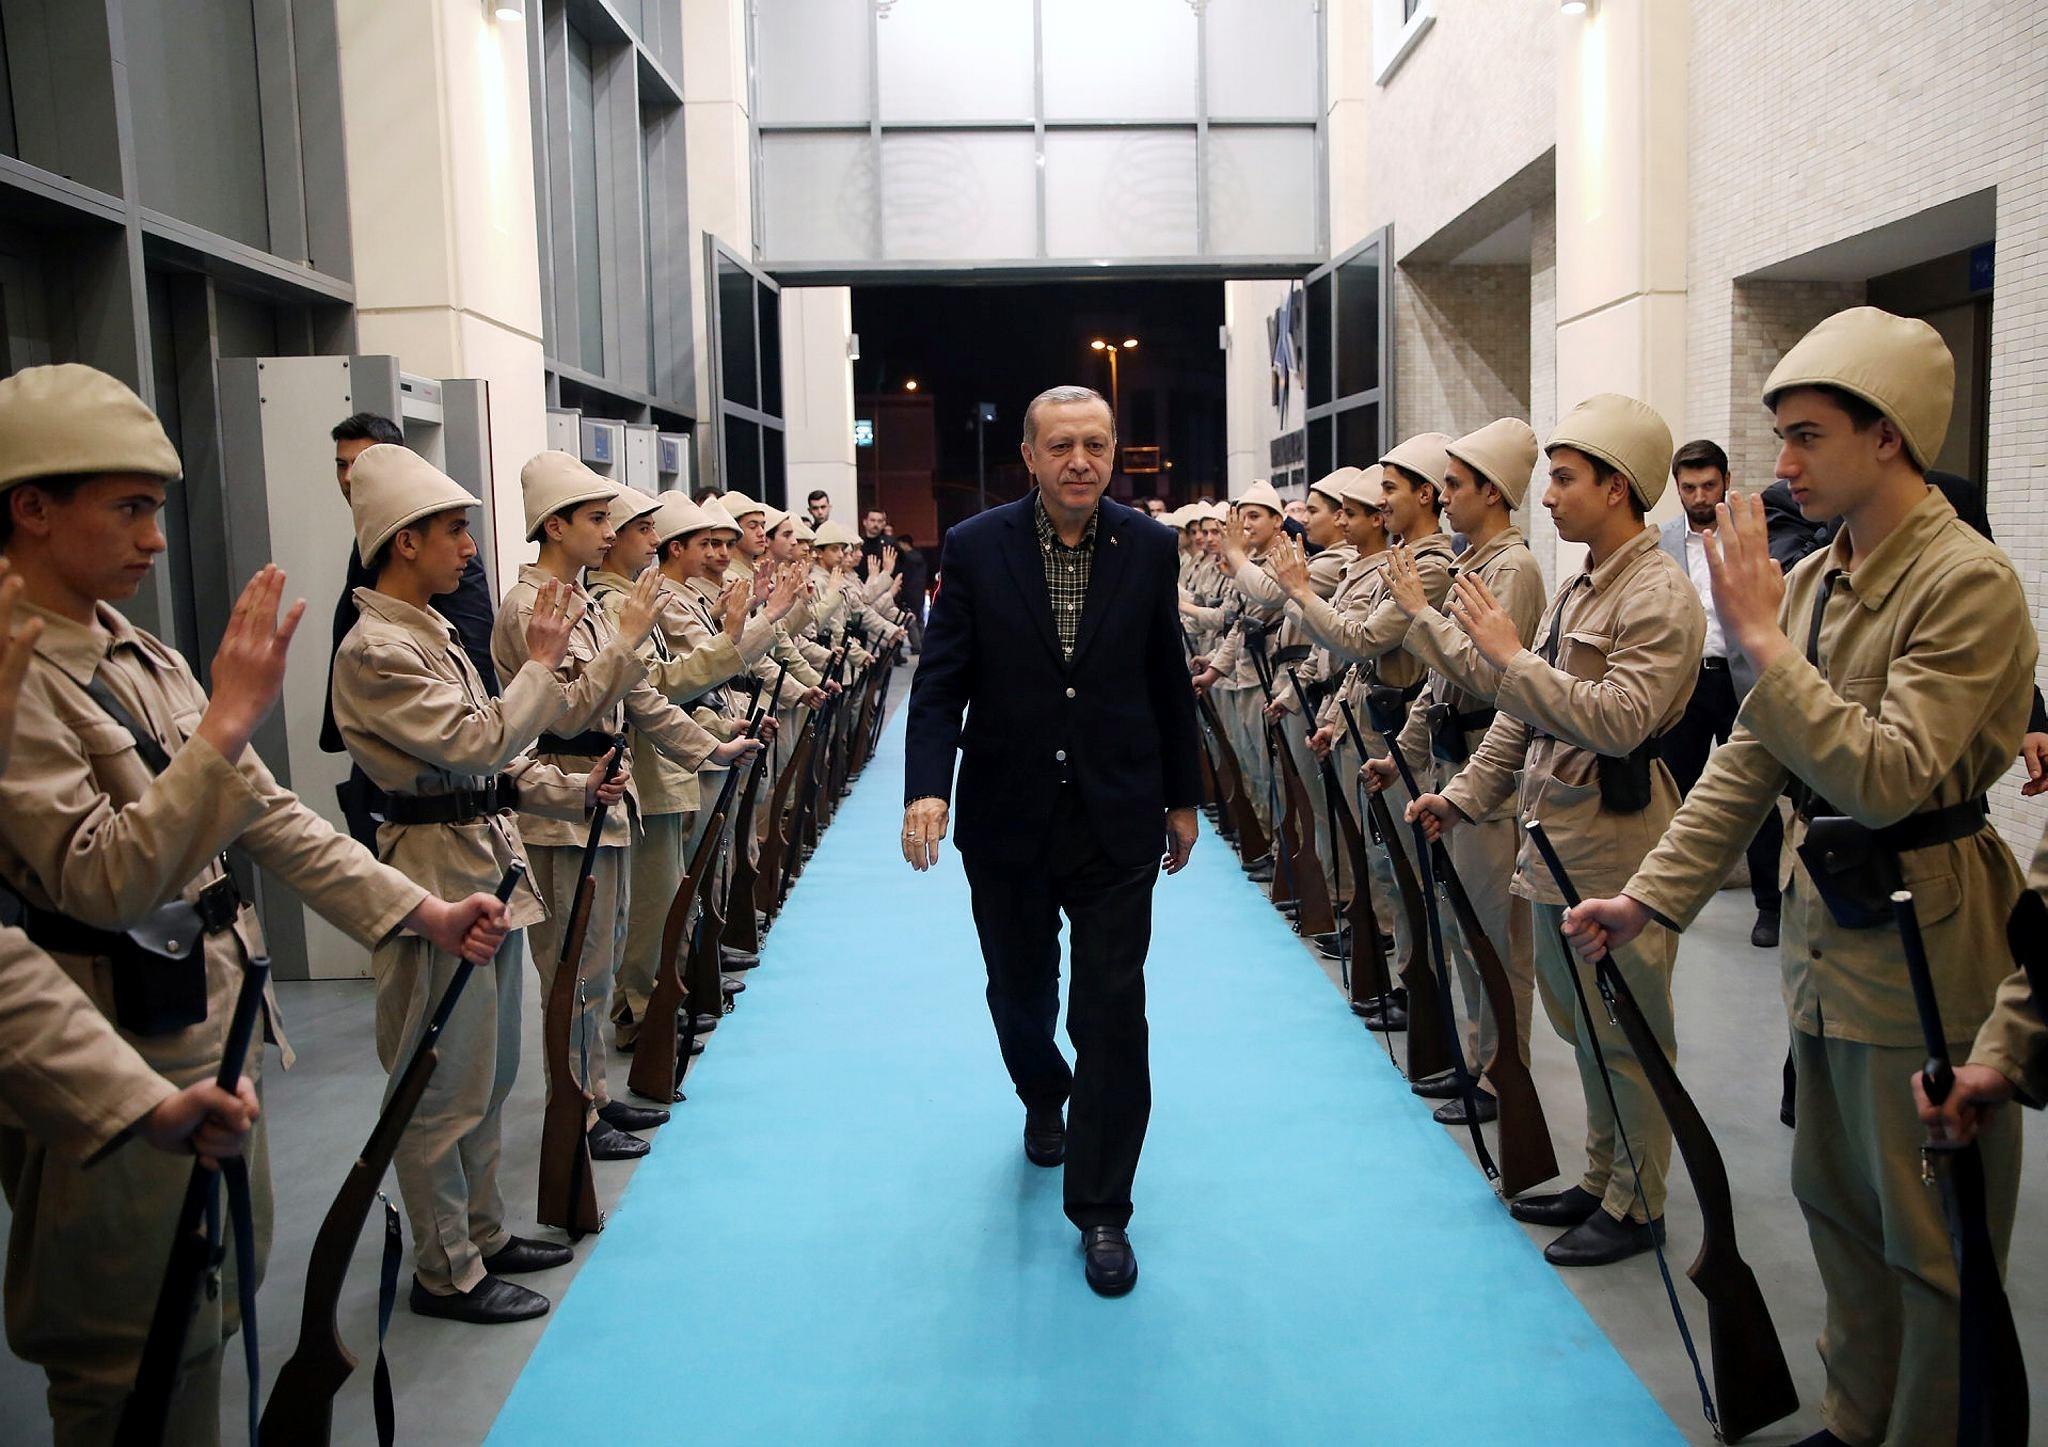 President Erdou011fan walks between young men dressed as Turkish soldiers who fought in World War I in Yahya Kemal Beyatlu0131 Cultural Center in Istanbul's Ku00fcu00e7u00fcku00e7ekmece district. (AA Photo)